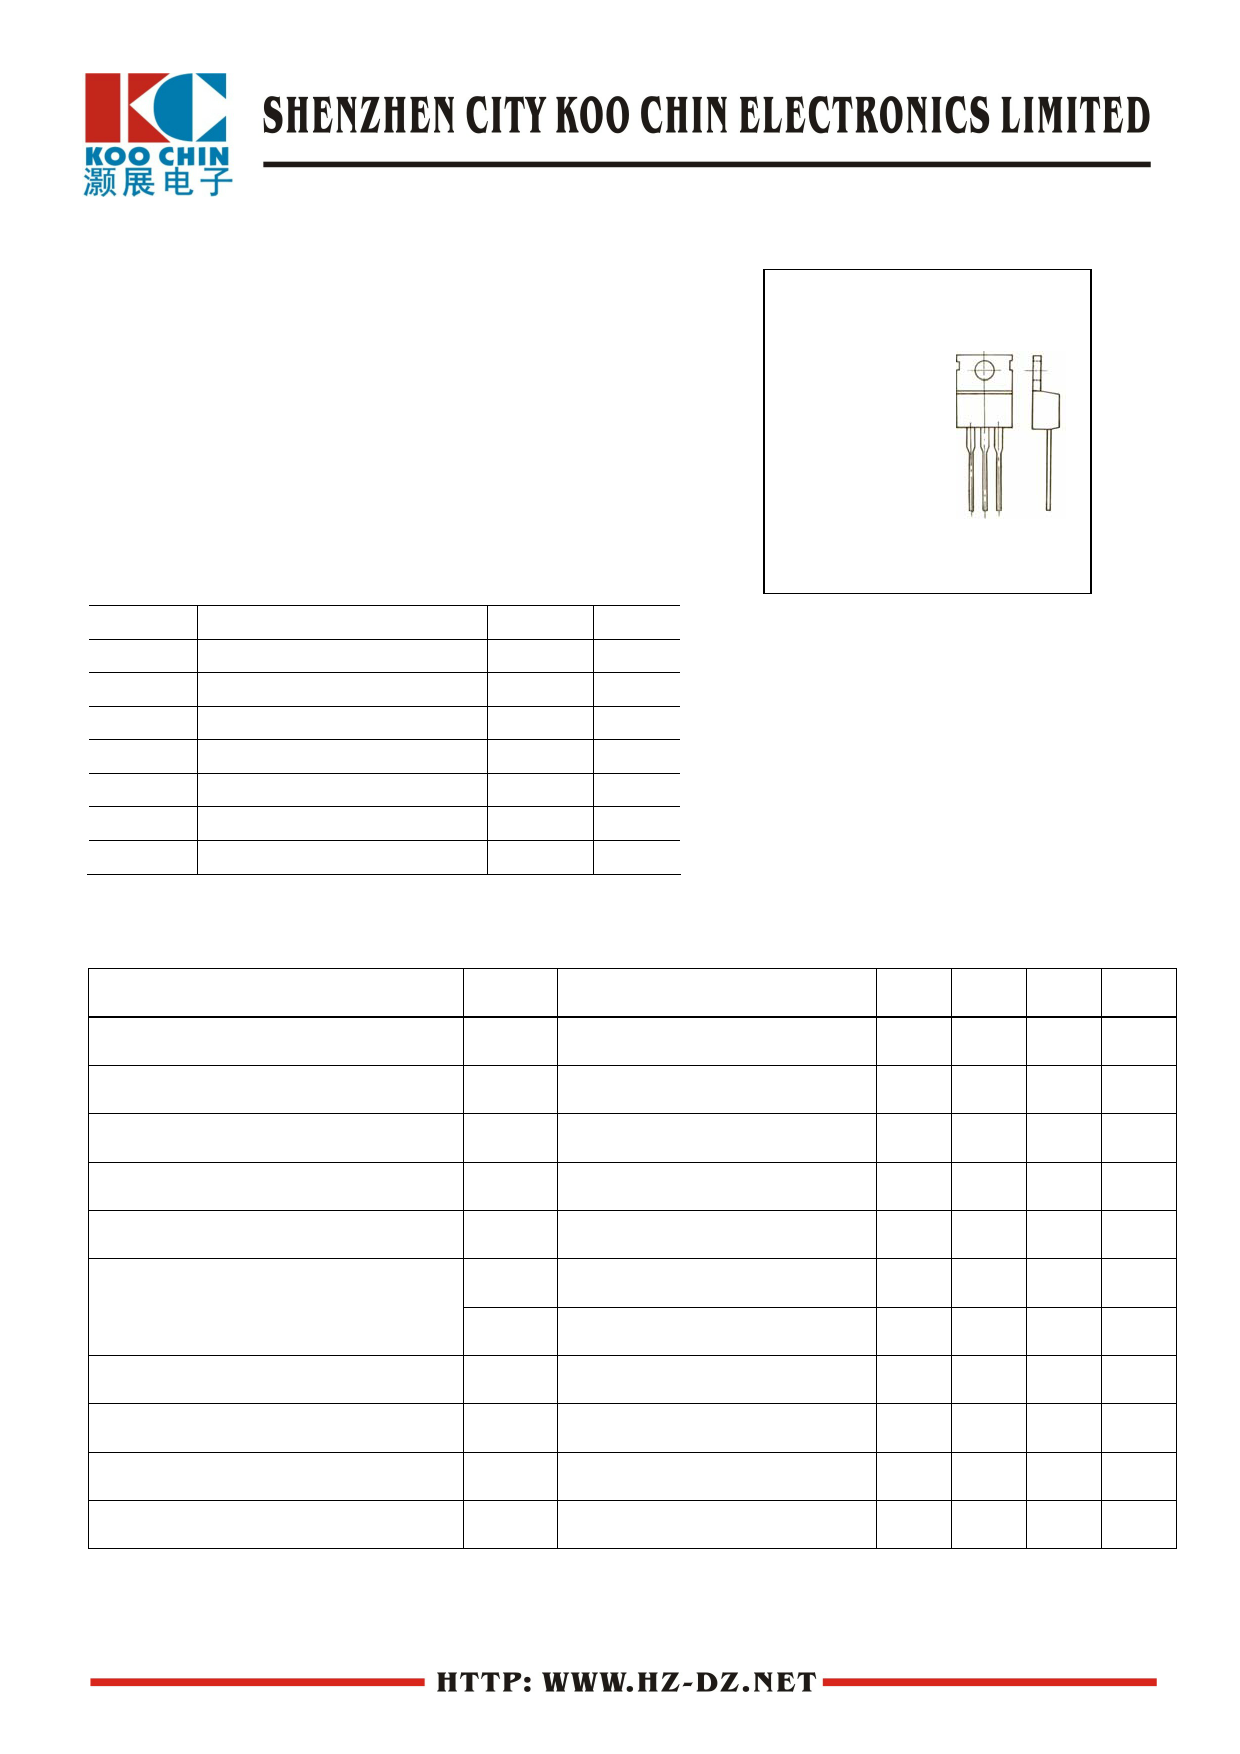 2SC4544 데이터시트 및 2SC4544 PDF